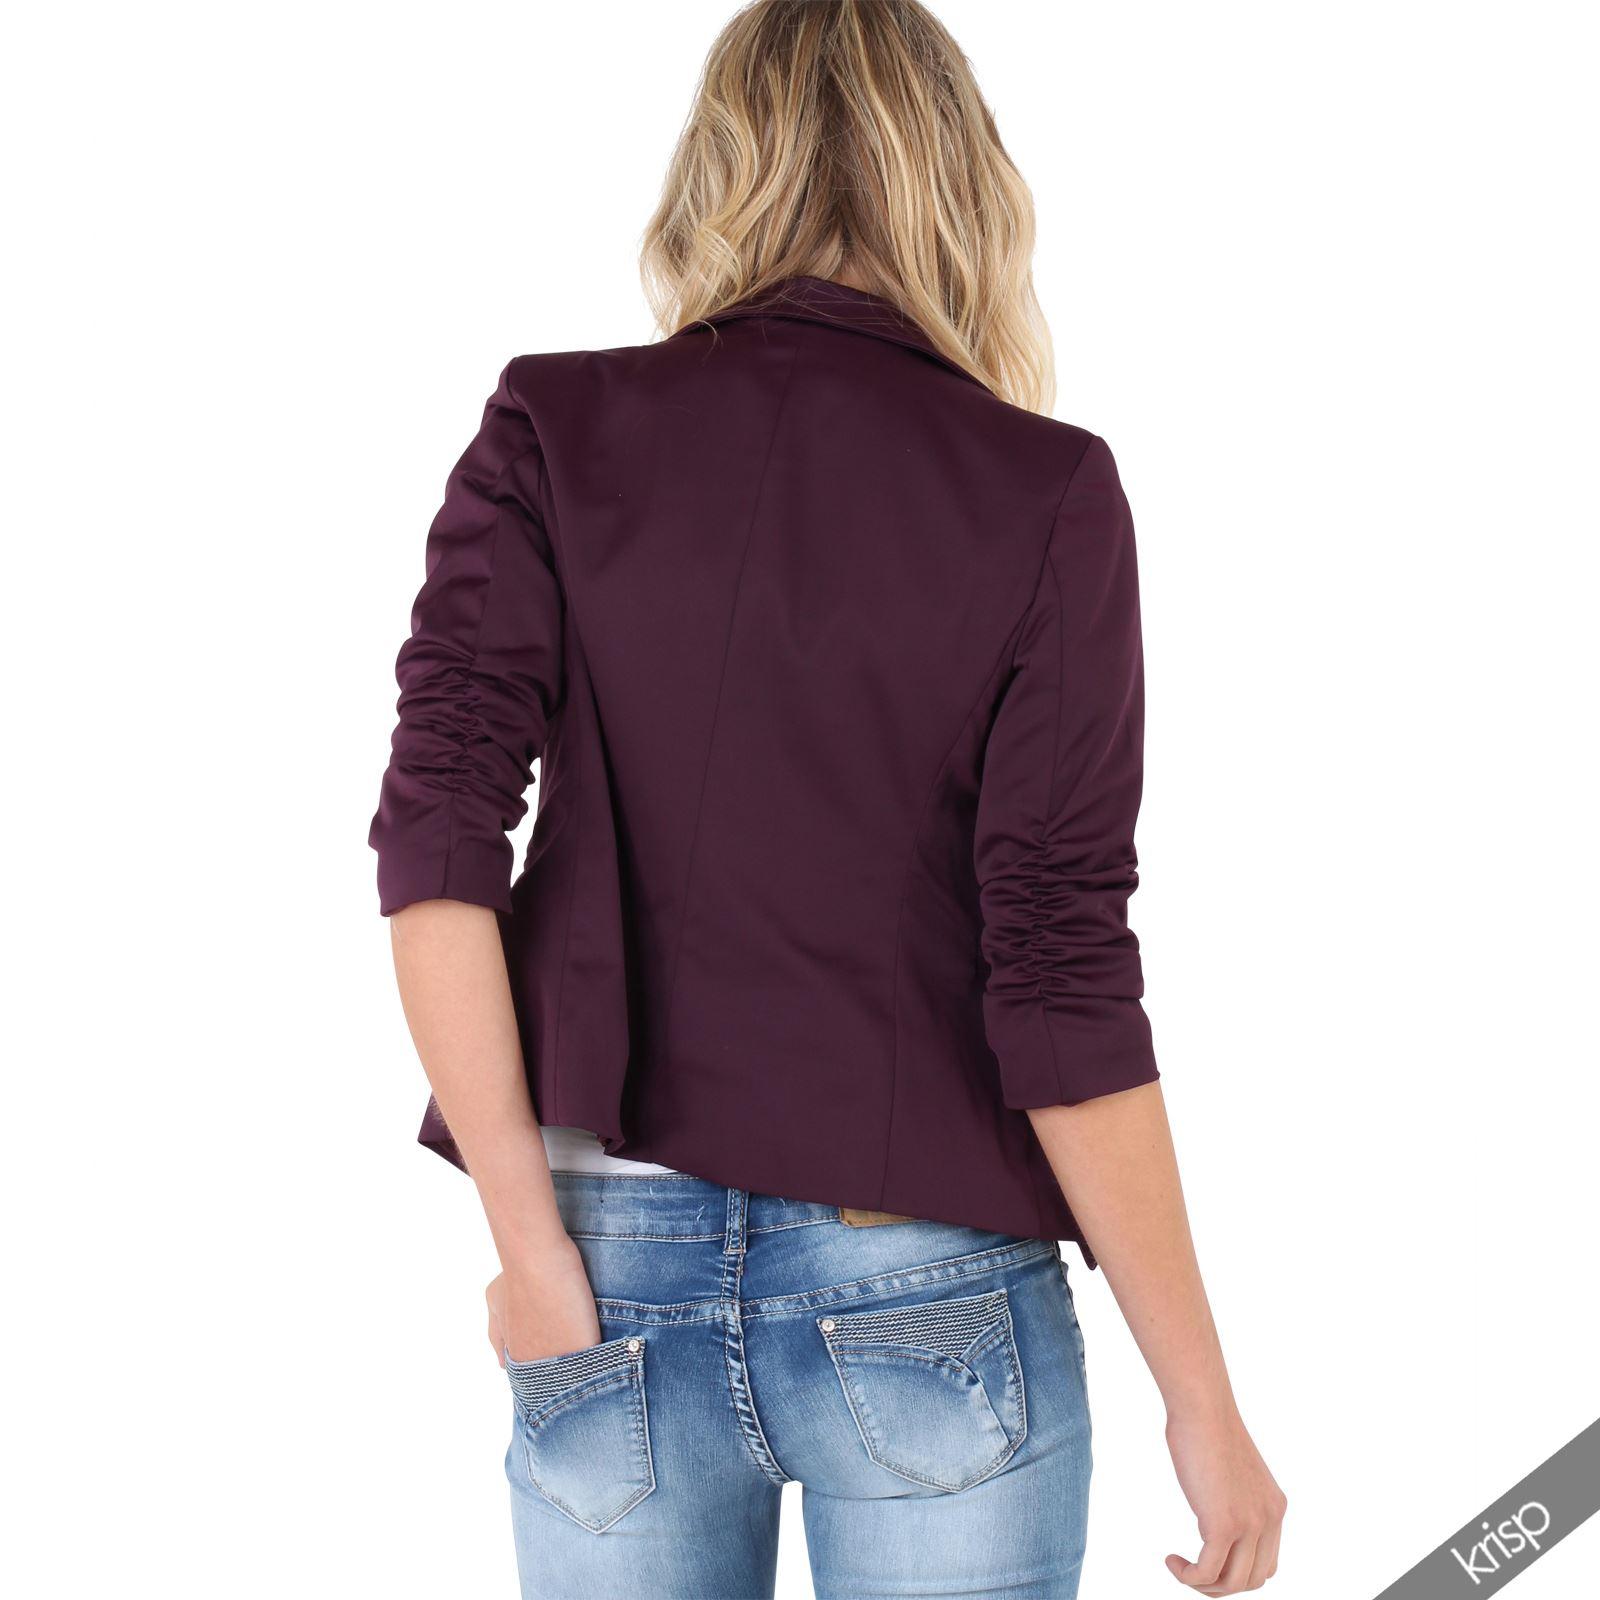 damen satin blazer taillierte jacke 3 4 rmel kurze sommerjacke sakko jackett ebay. Black Bedroom Furniture Sets. Home Design Ideas